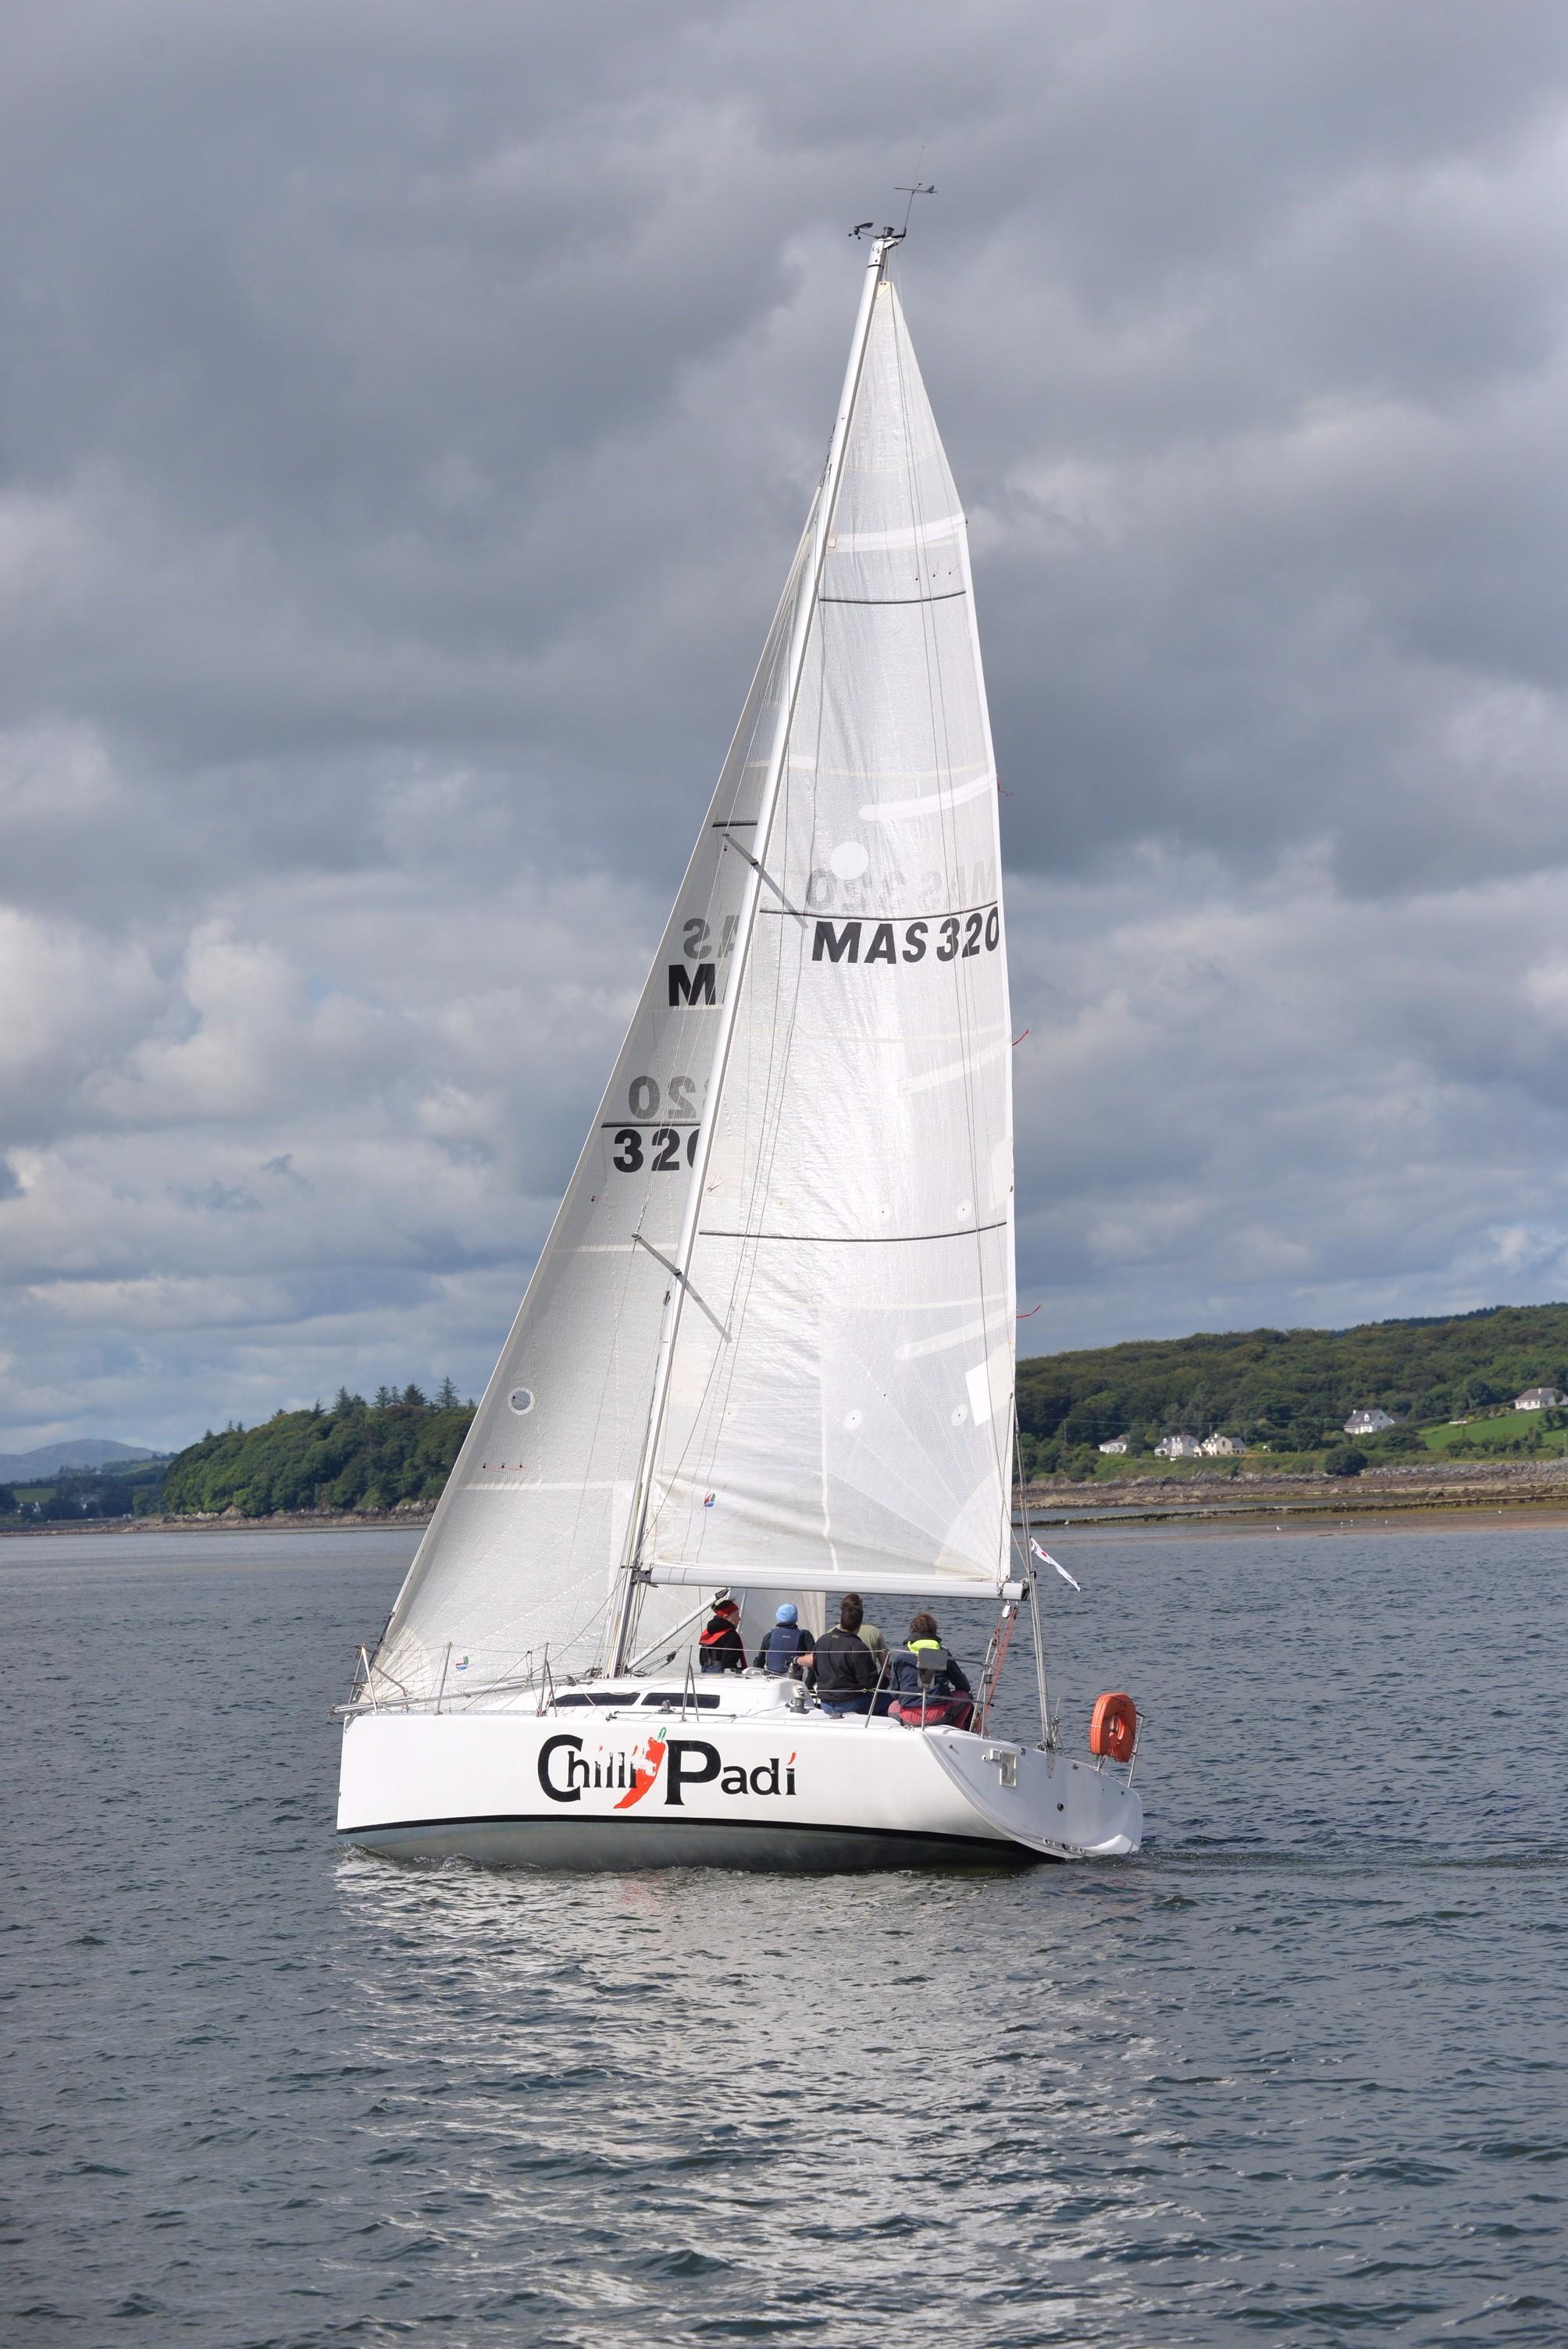 Seaquest Sj 320 Boat For Sale